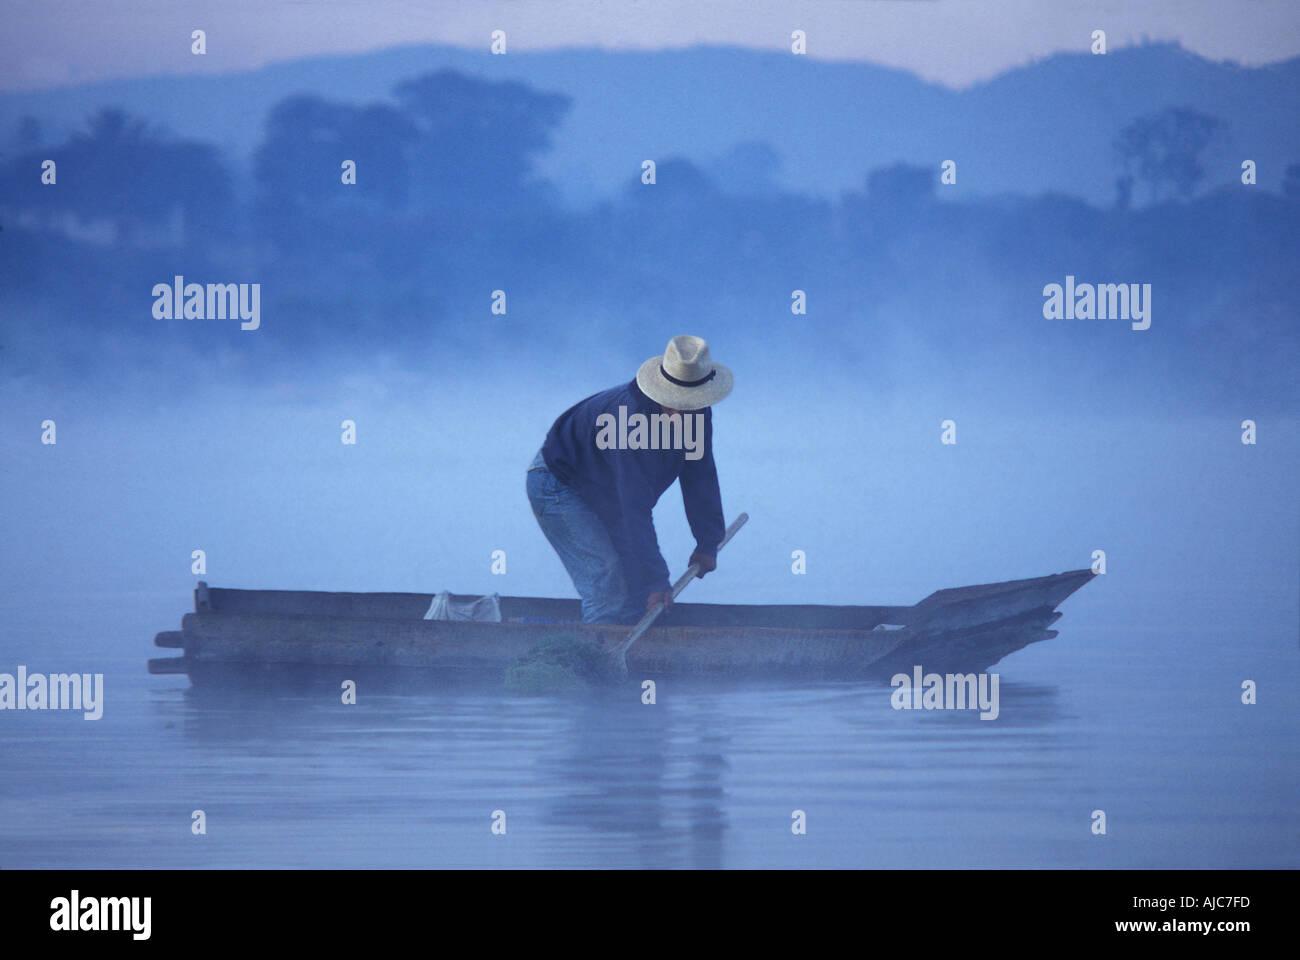 Dredging reeds from a canoe at dawn Santiago Atitlan a Tzutuhil Maya community Lake Atitlan Guatemala Stock Photo